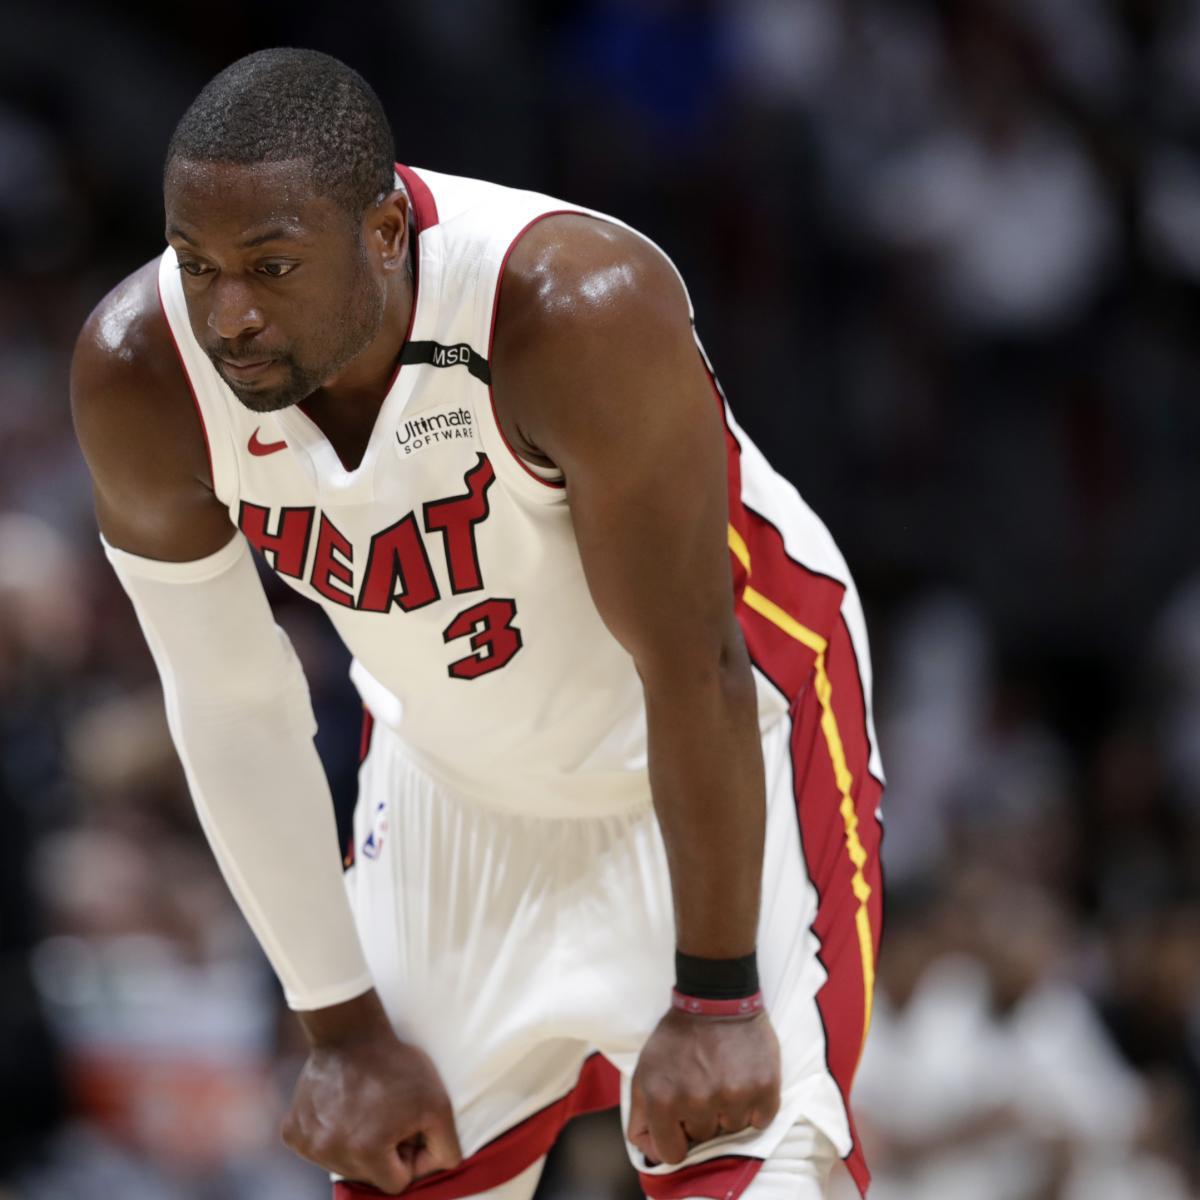 Dwyane Wade Workout: The Latest Miami Heat News (Bleacher Report)